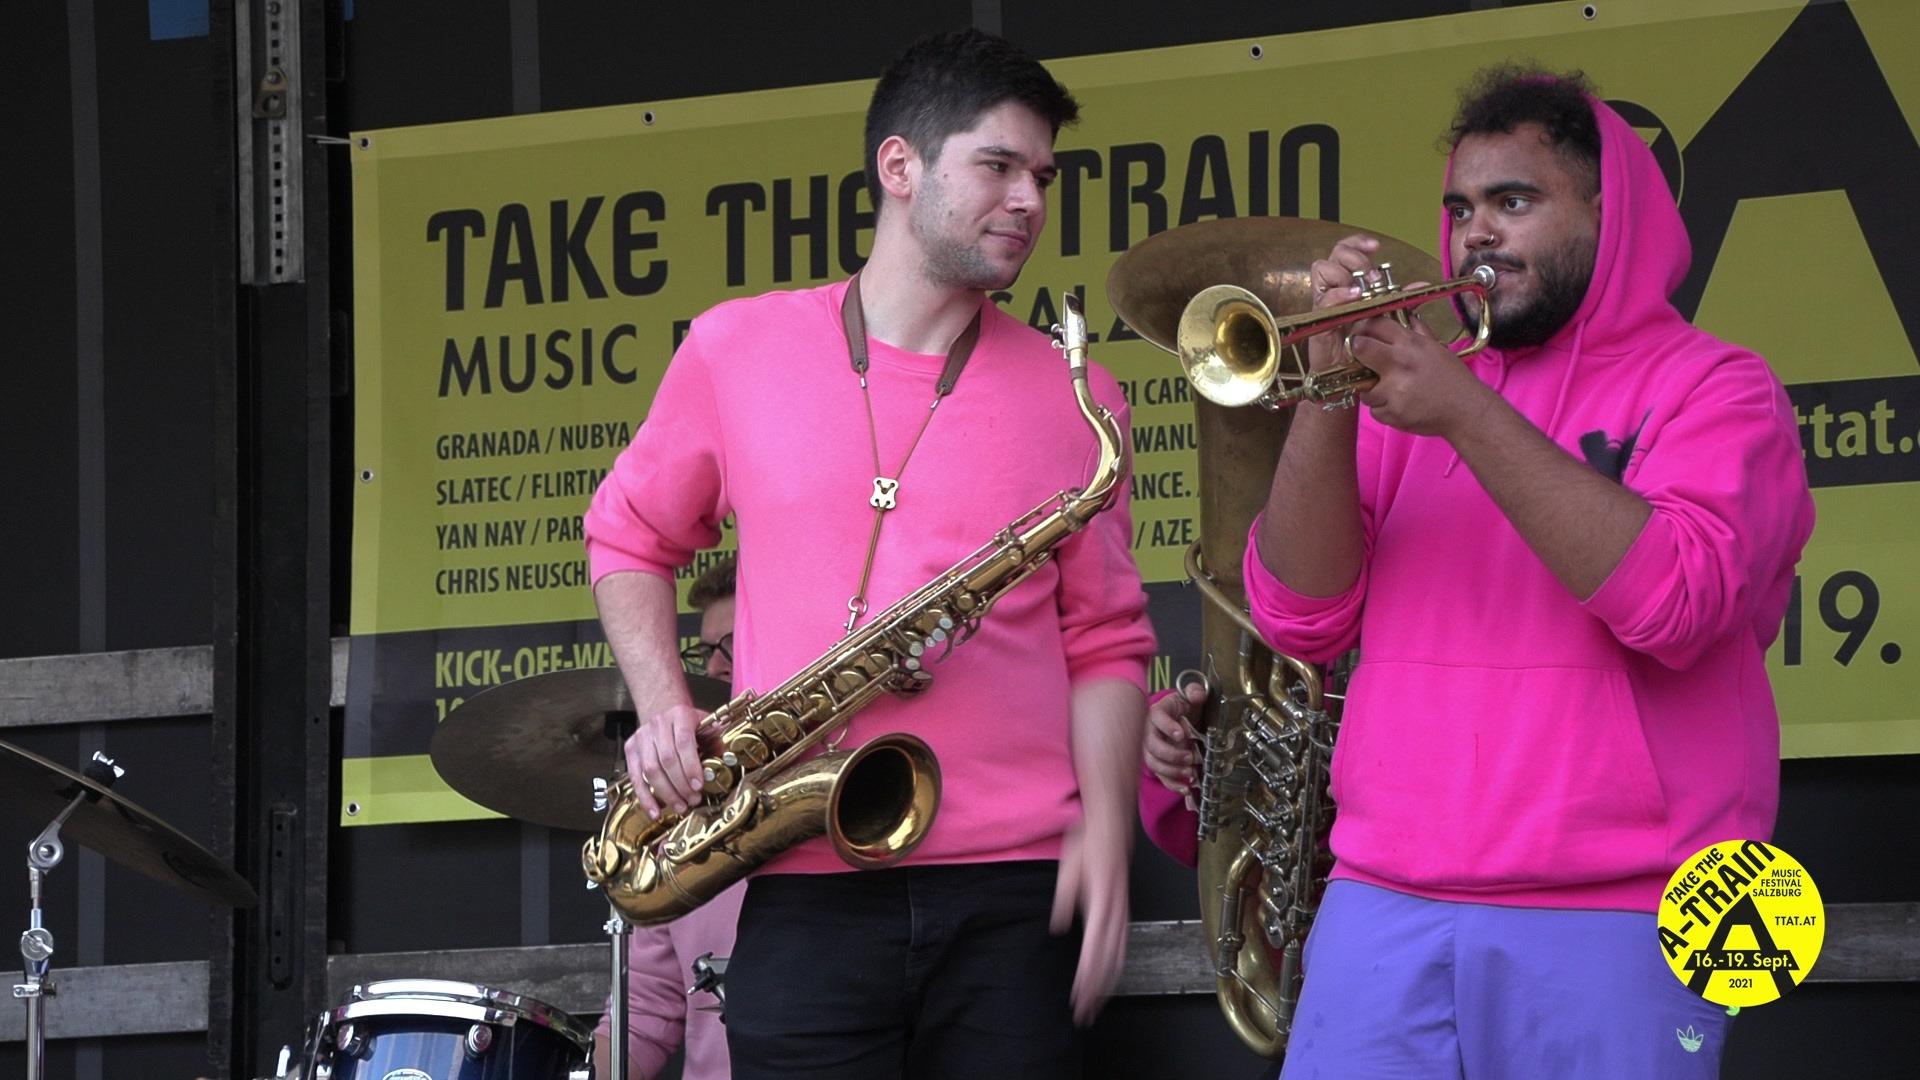 TakeTheA Train Brassbeat 01